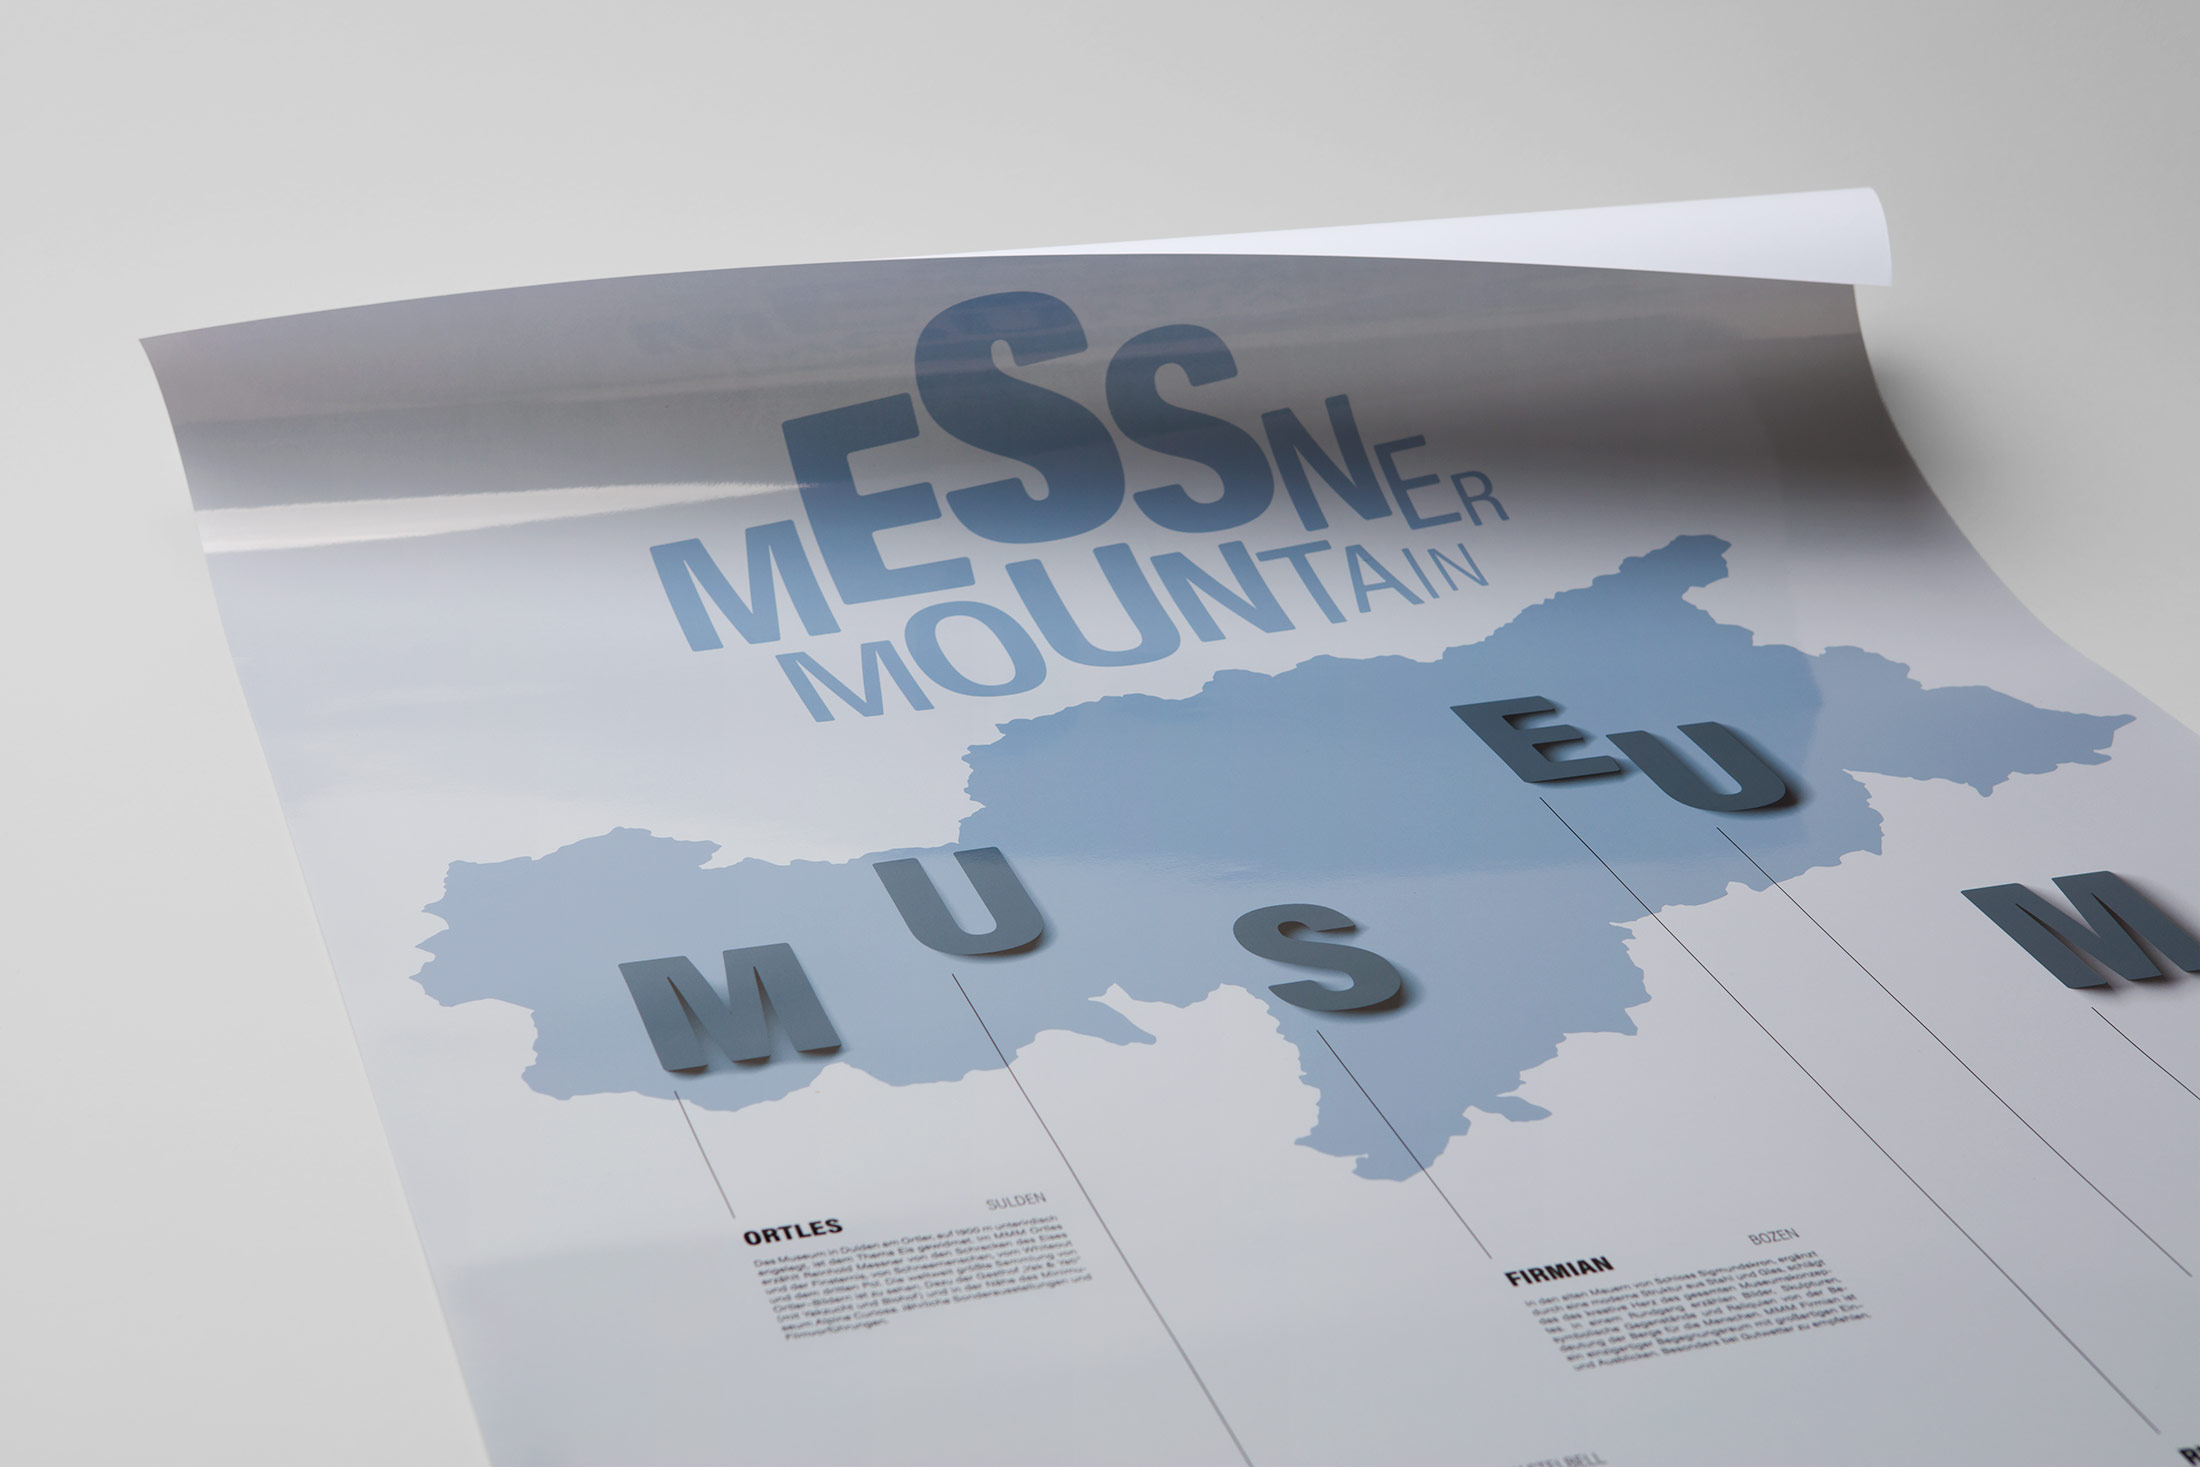 Messner_Mountain_Museum_13-Mitja_Schneehage